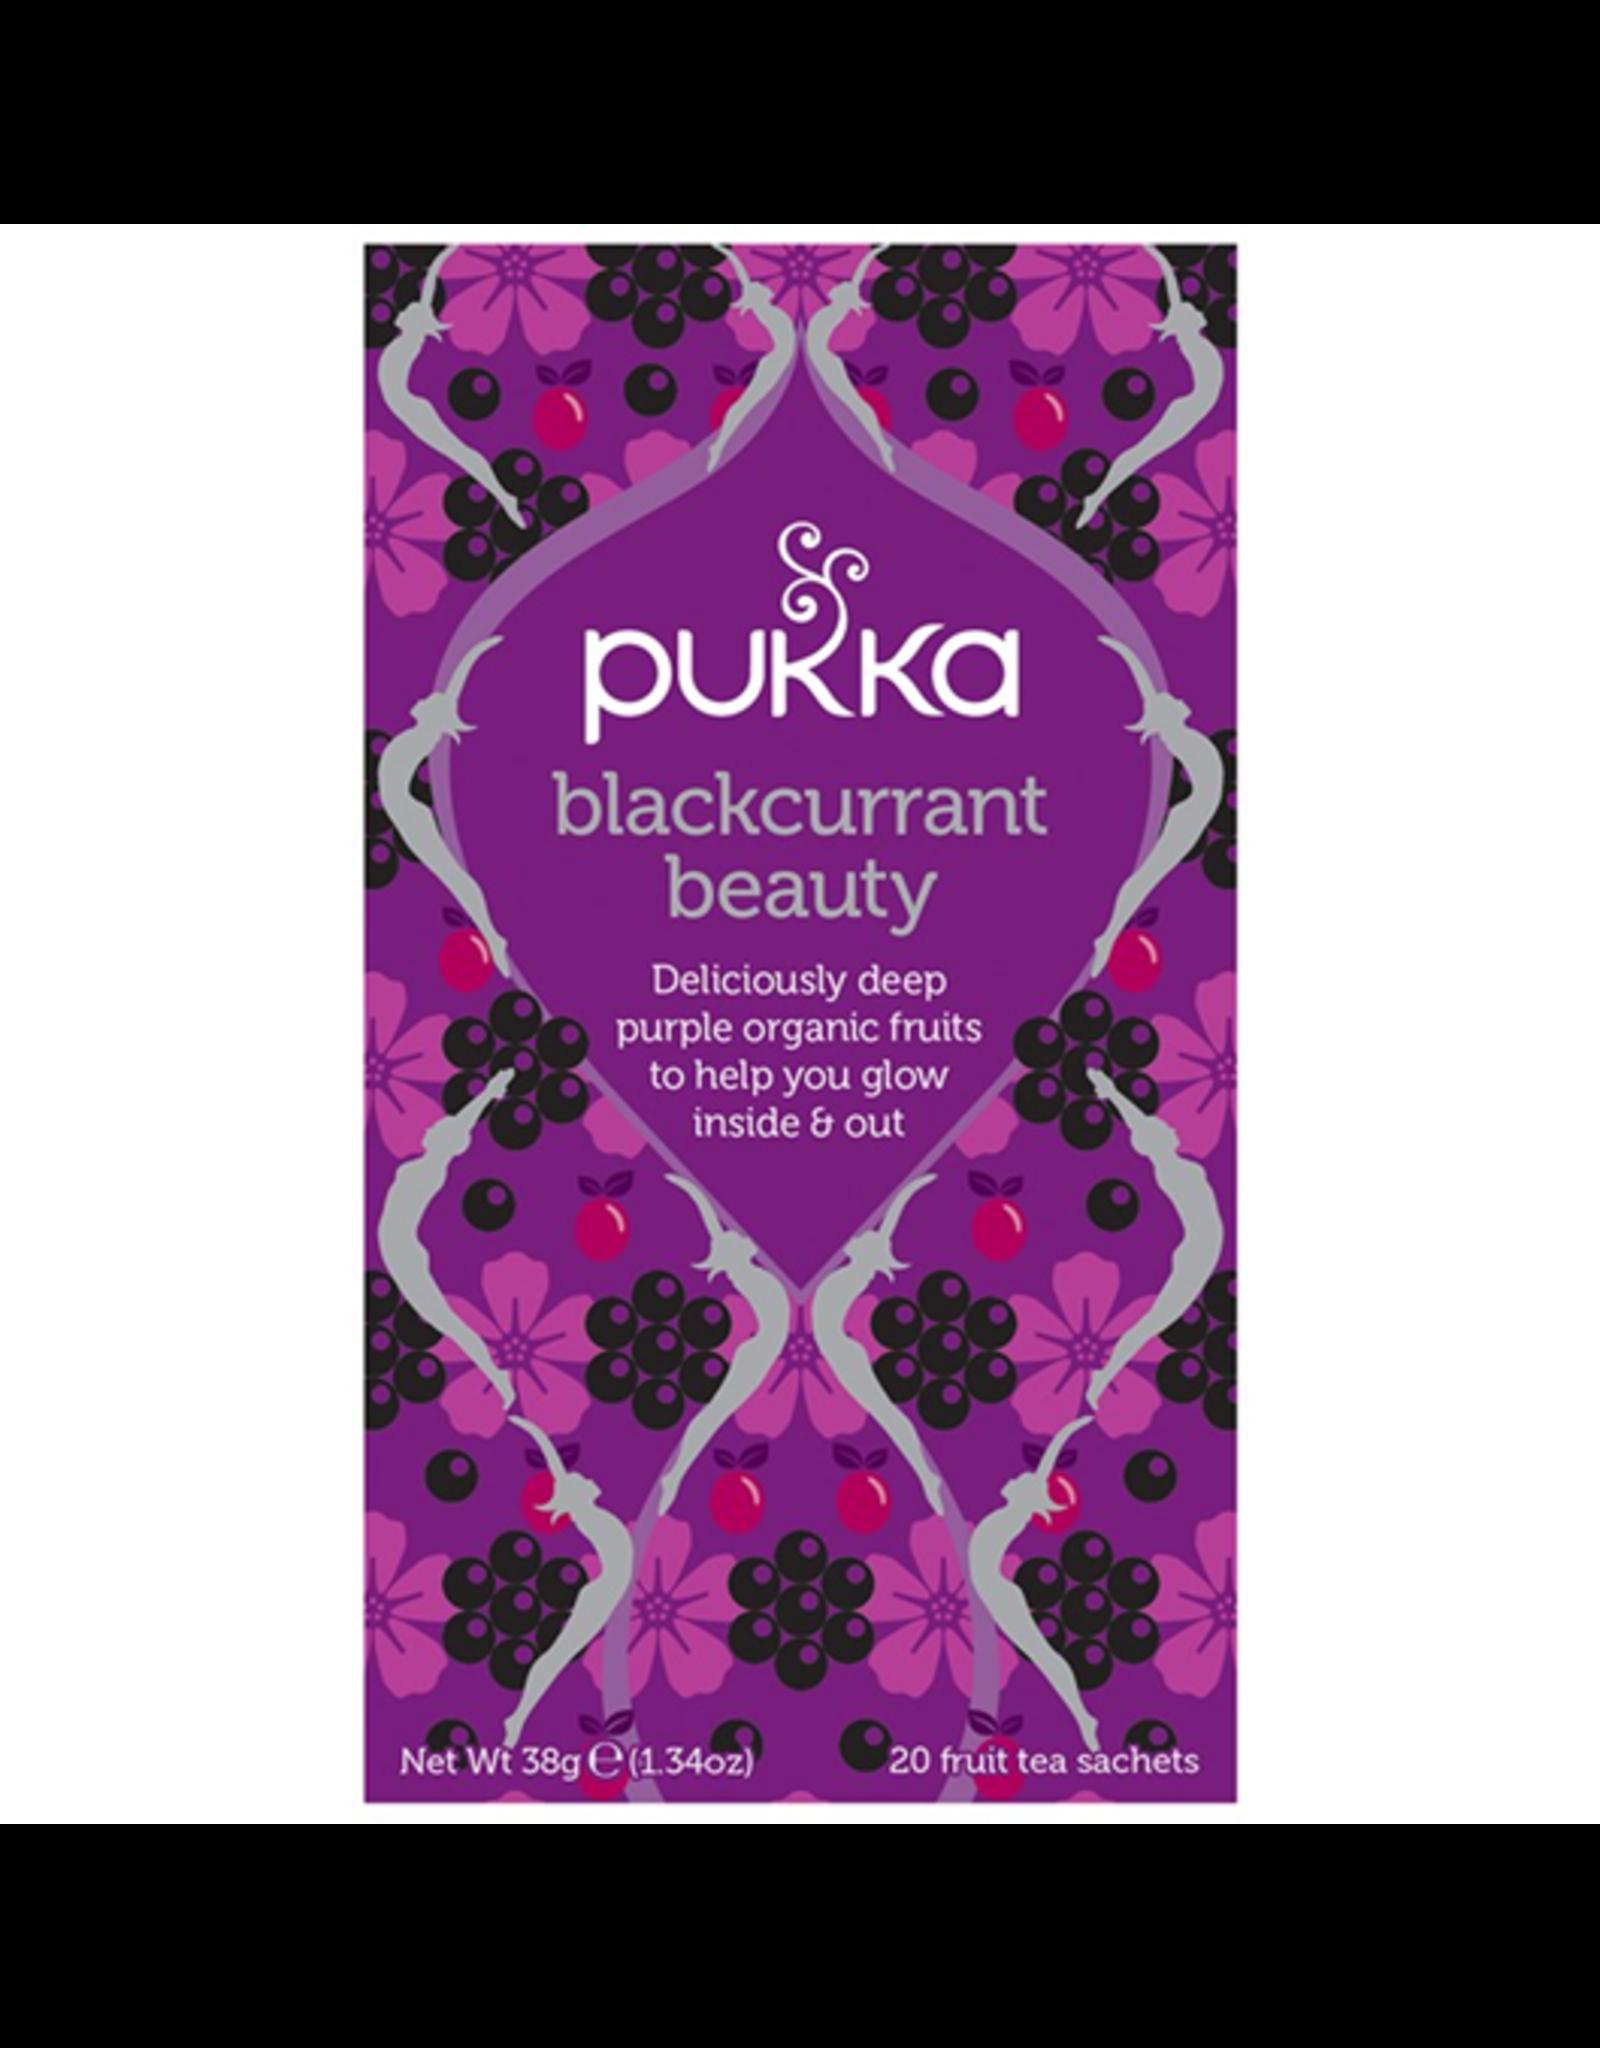 Pukka Blackcurrant Beauty